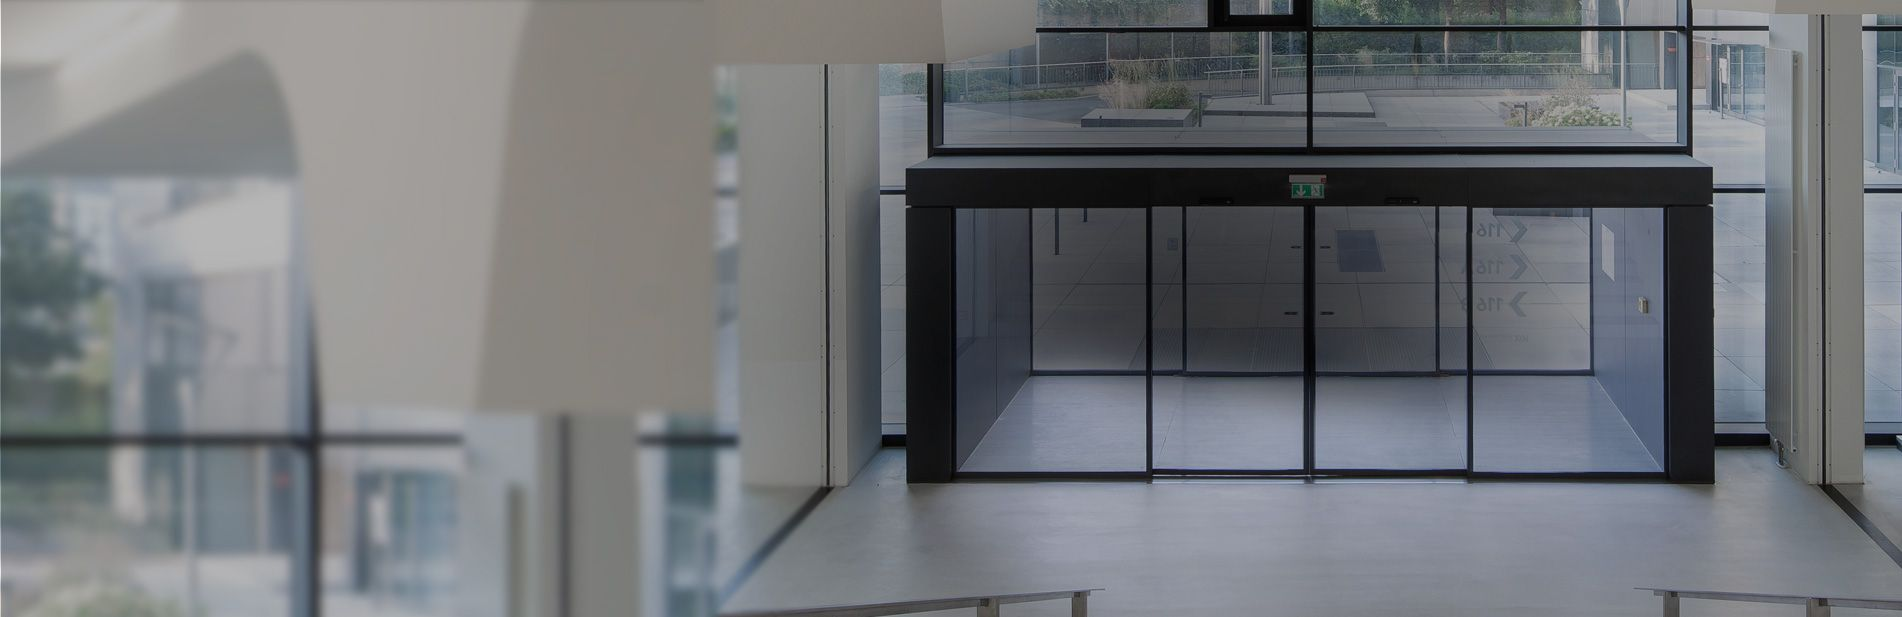 master-ingenieros-puertas-automaticas-slide-022